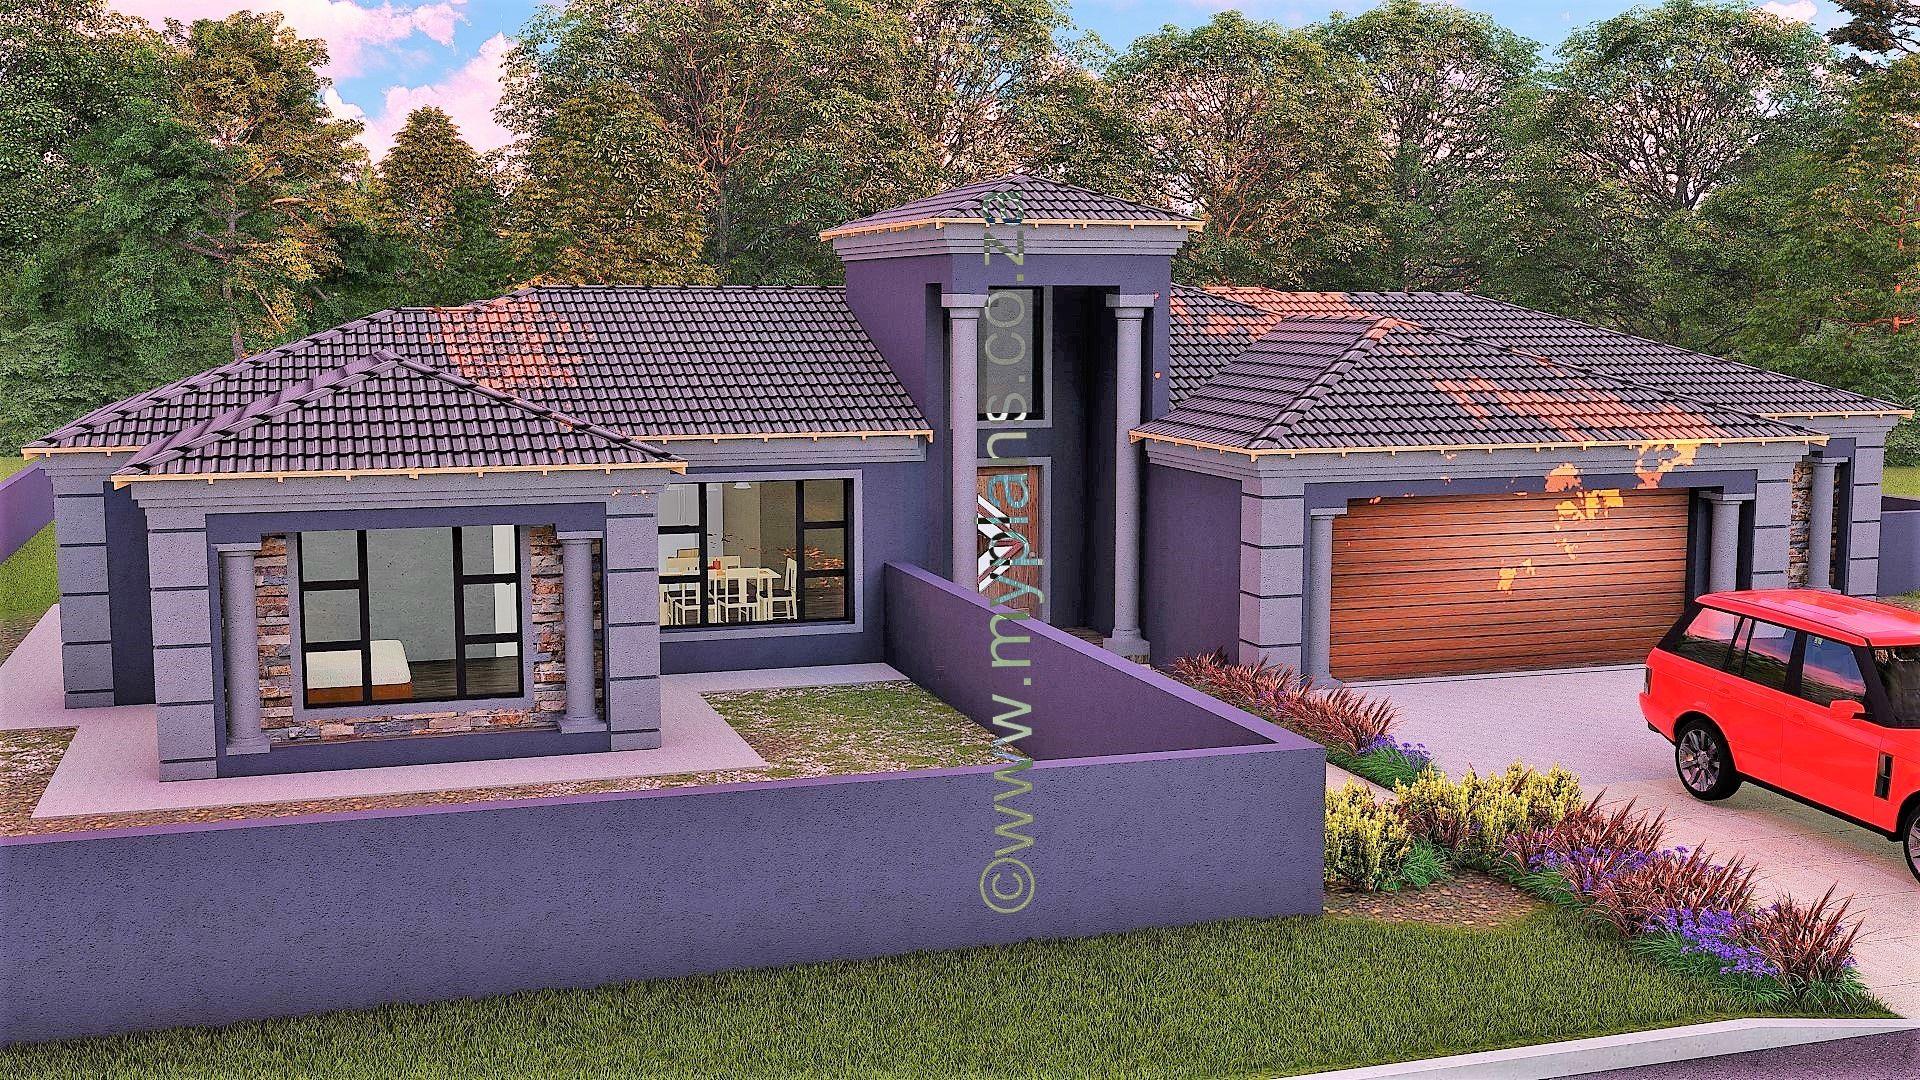 4 Bedroom House Plan Mlb 72s 4 Bedroom House Plans Bedroom House Plans House Plans South Africa